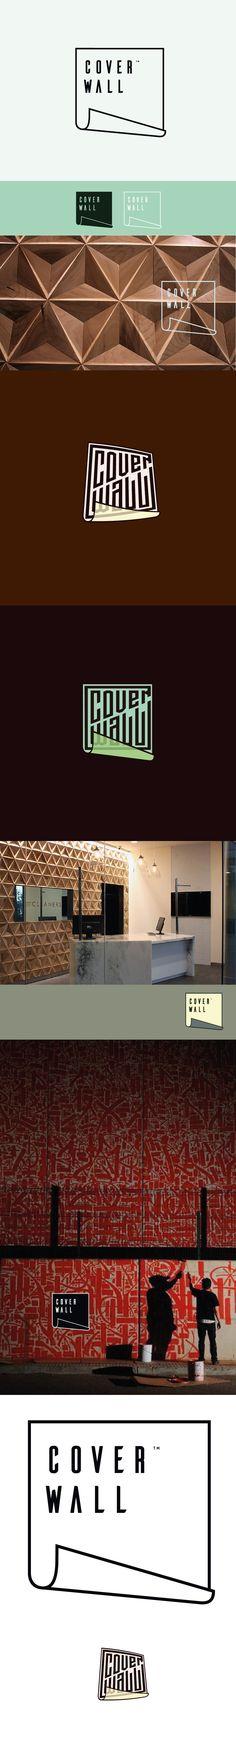 Ontwerpen | Coverwall needs a clever, modern-artsy logo | Logo ontwerp ontwerpwedstrijd